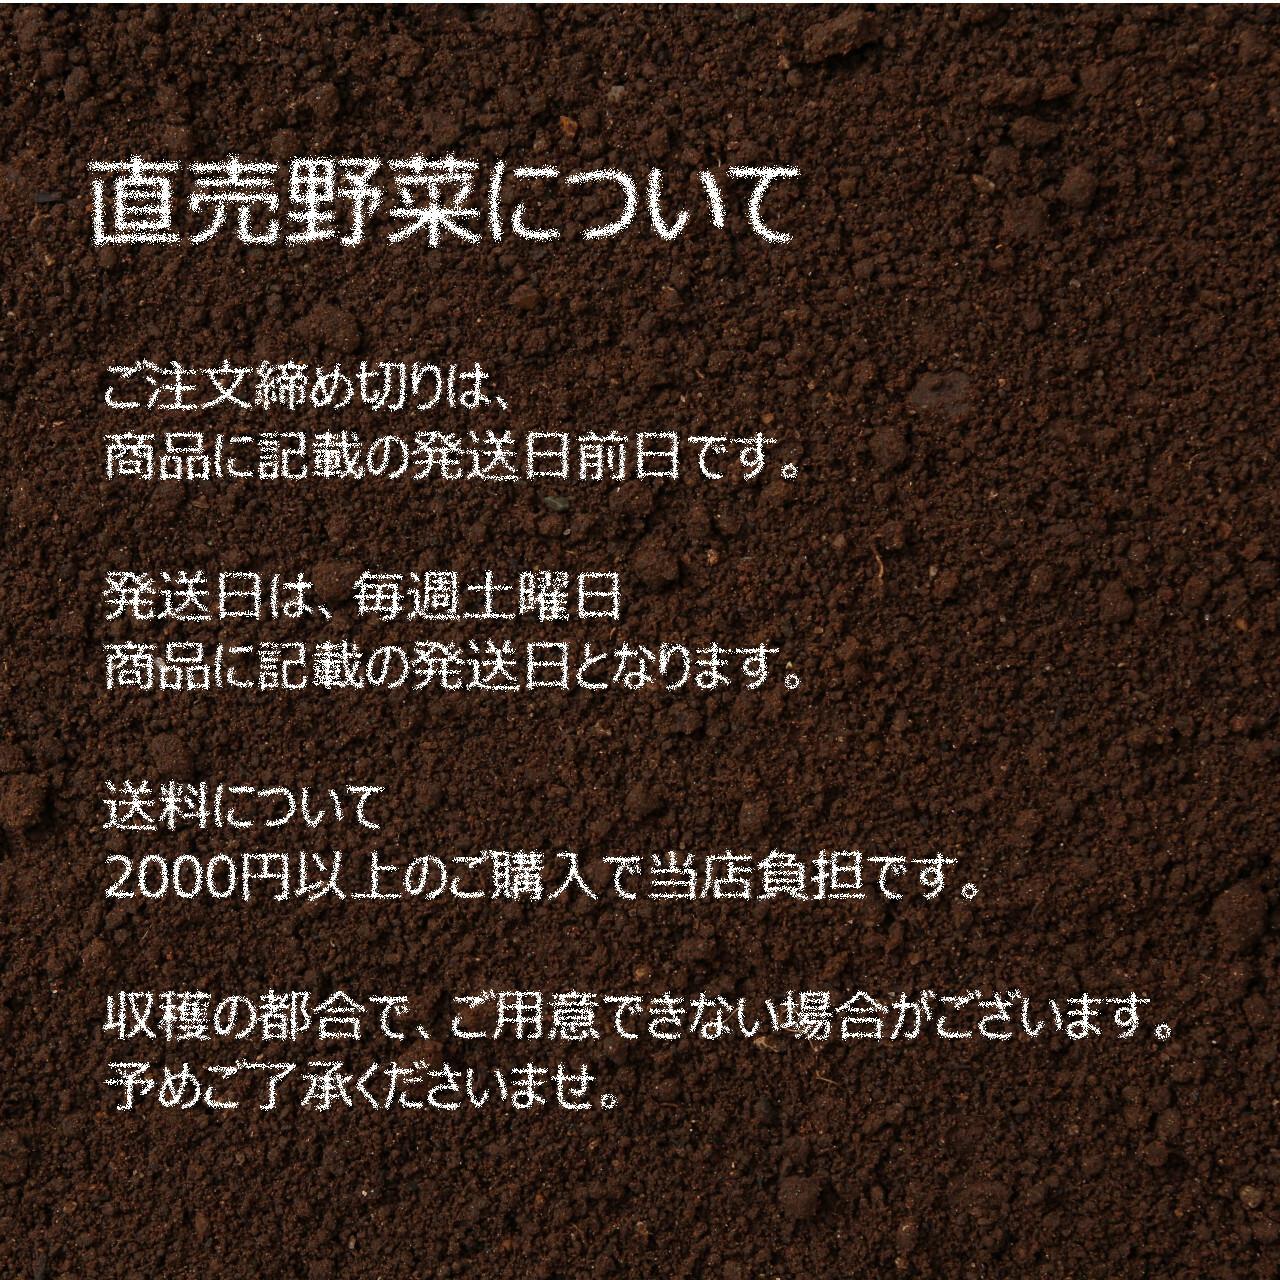 大根 約 1~2本 : 6月の朝採り直売野菜 春の新鮮野菜 6月13日発送予定